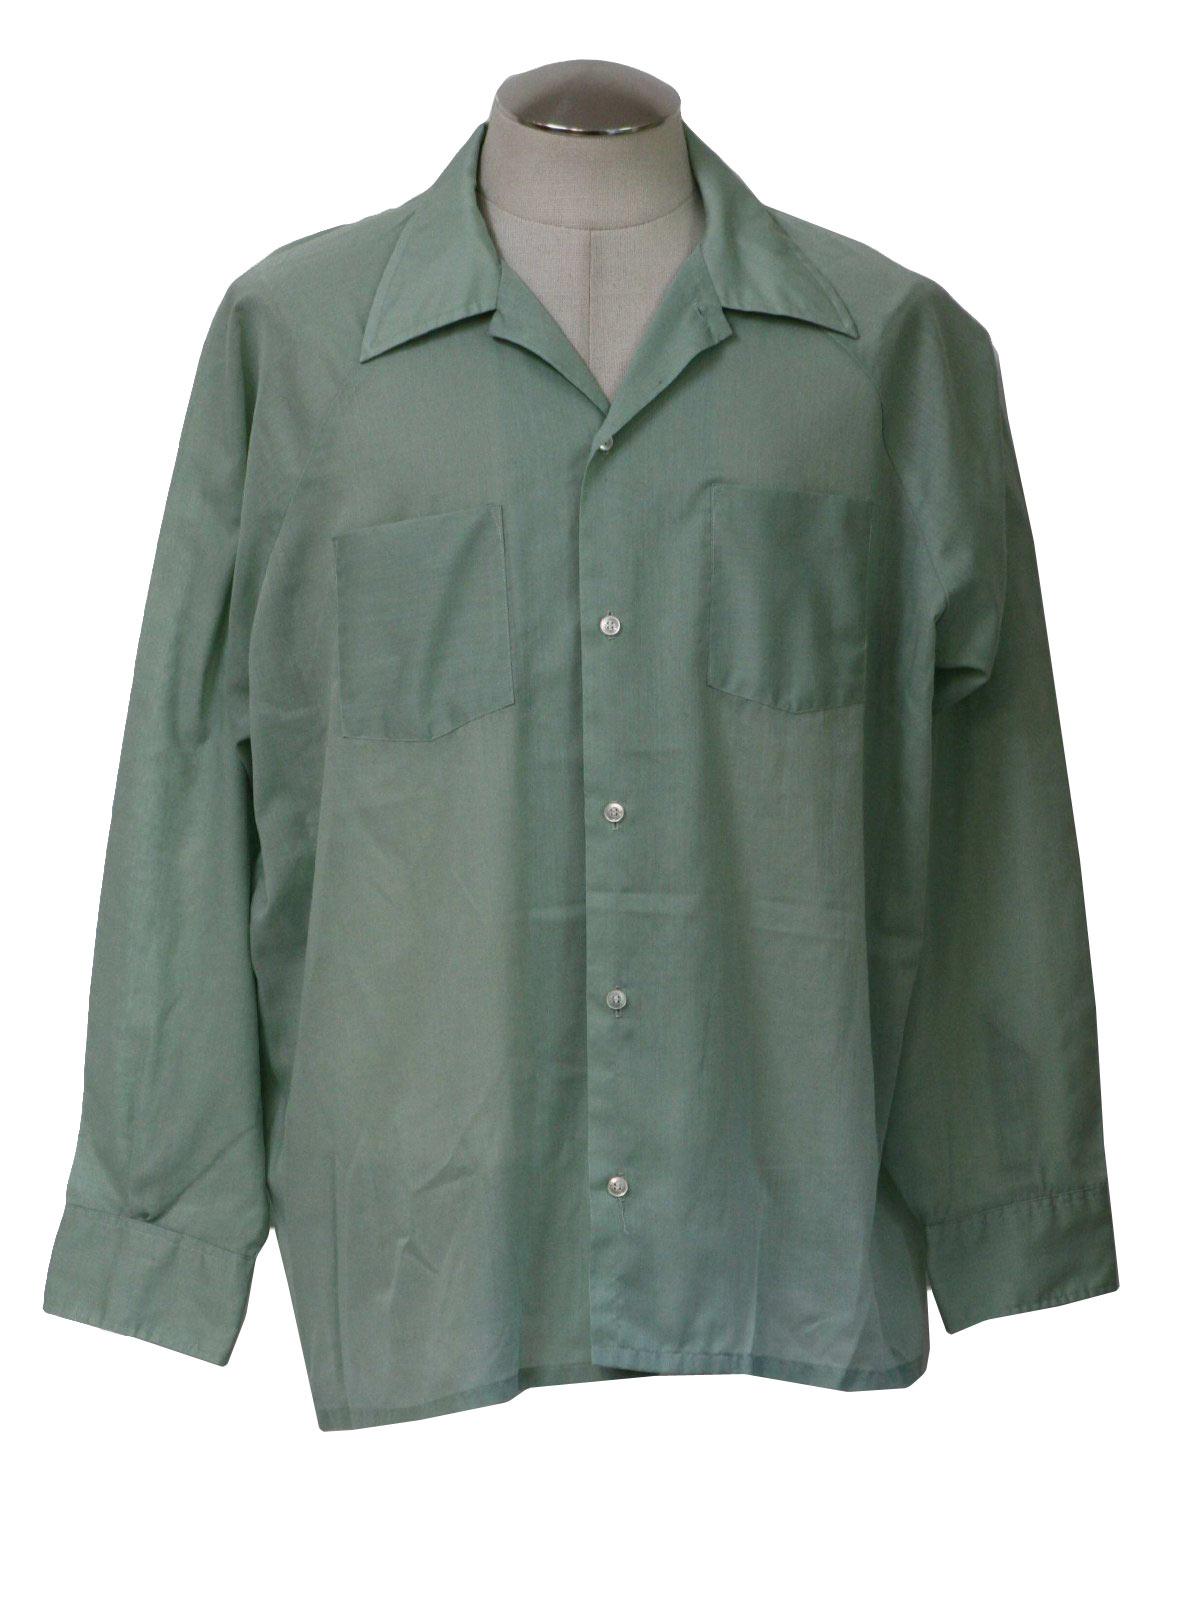 70s retro shirt early 70s career club mens celedon for Sports shirts near me